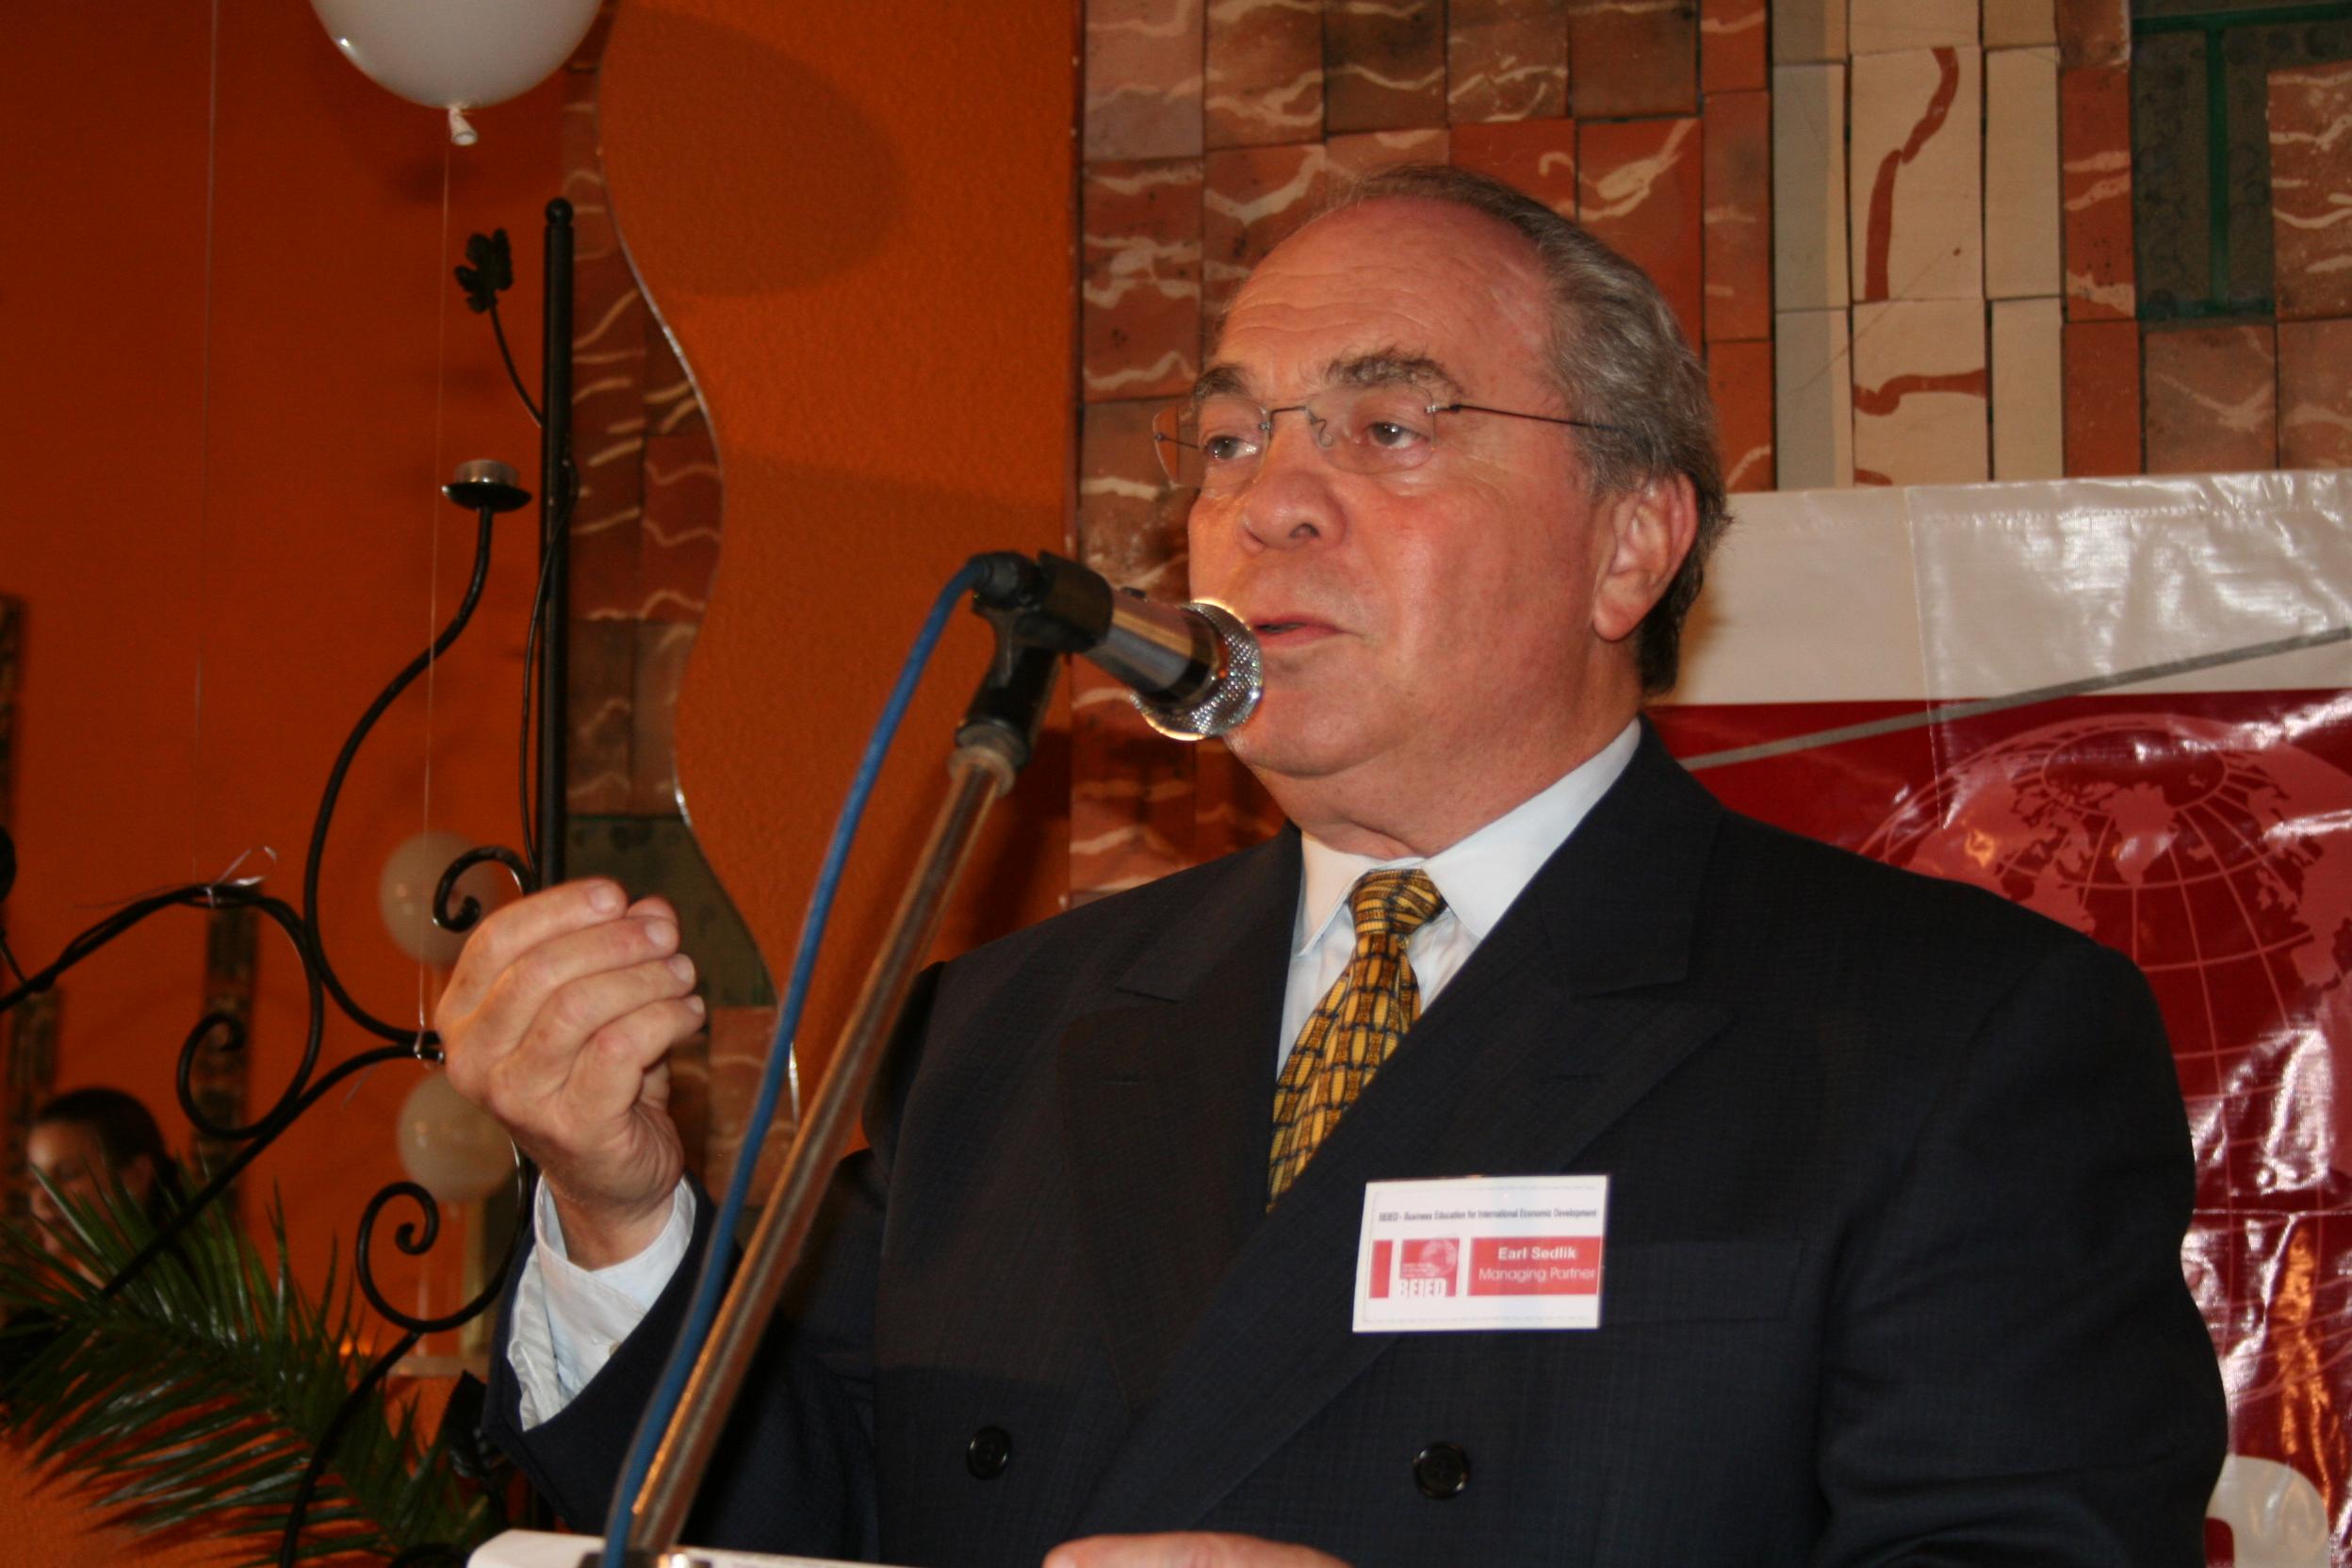 Earl Sedlik